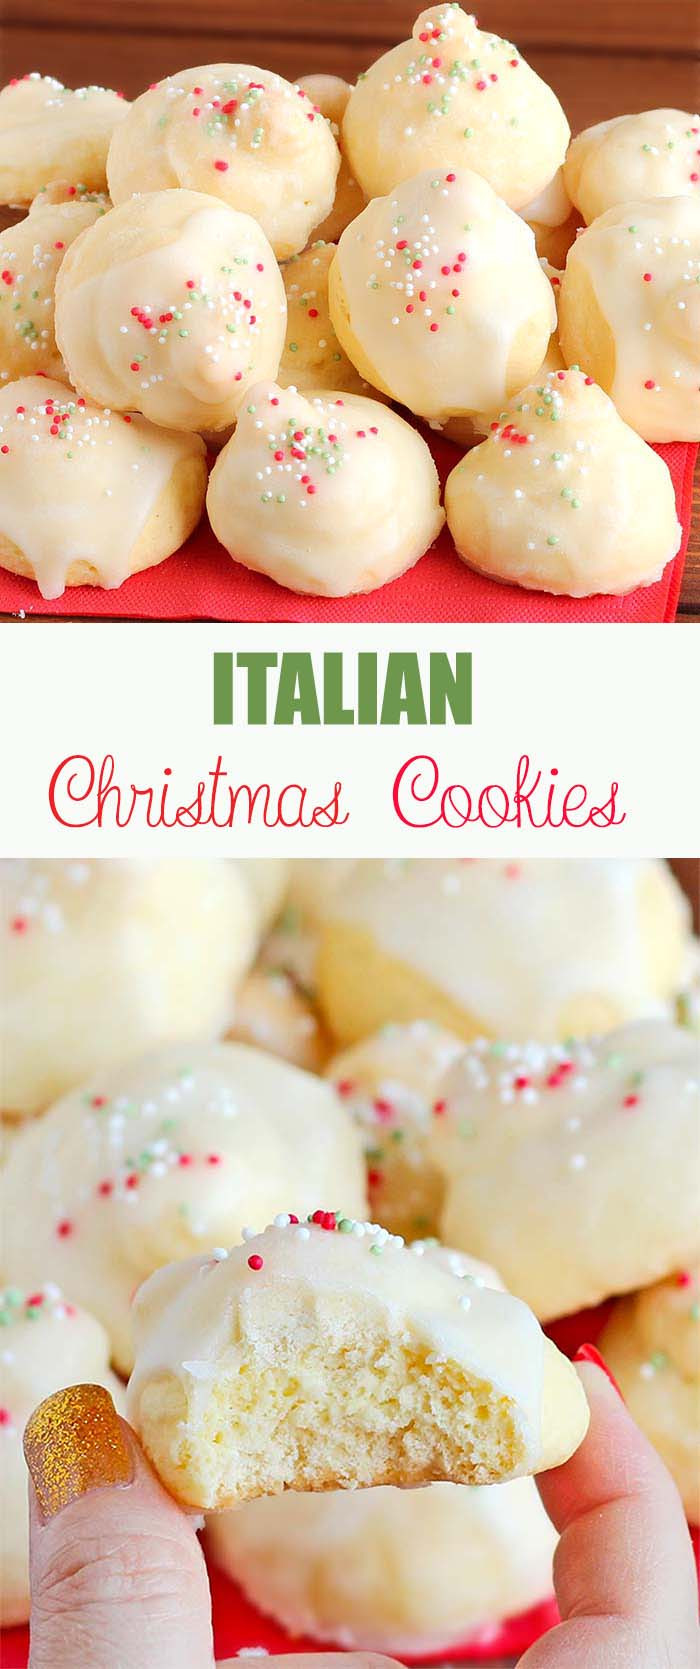 Italian Christmas Cookies Recipes  Italian Christmas Cookies Cakescottage